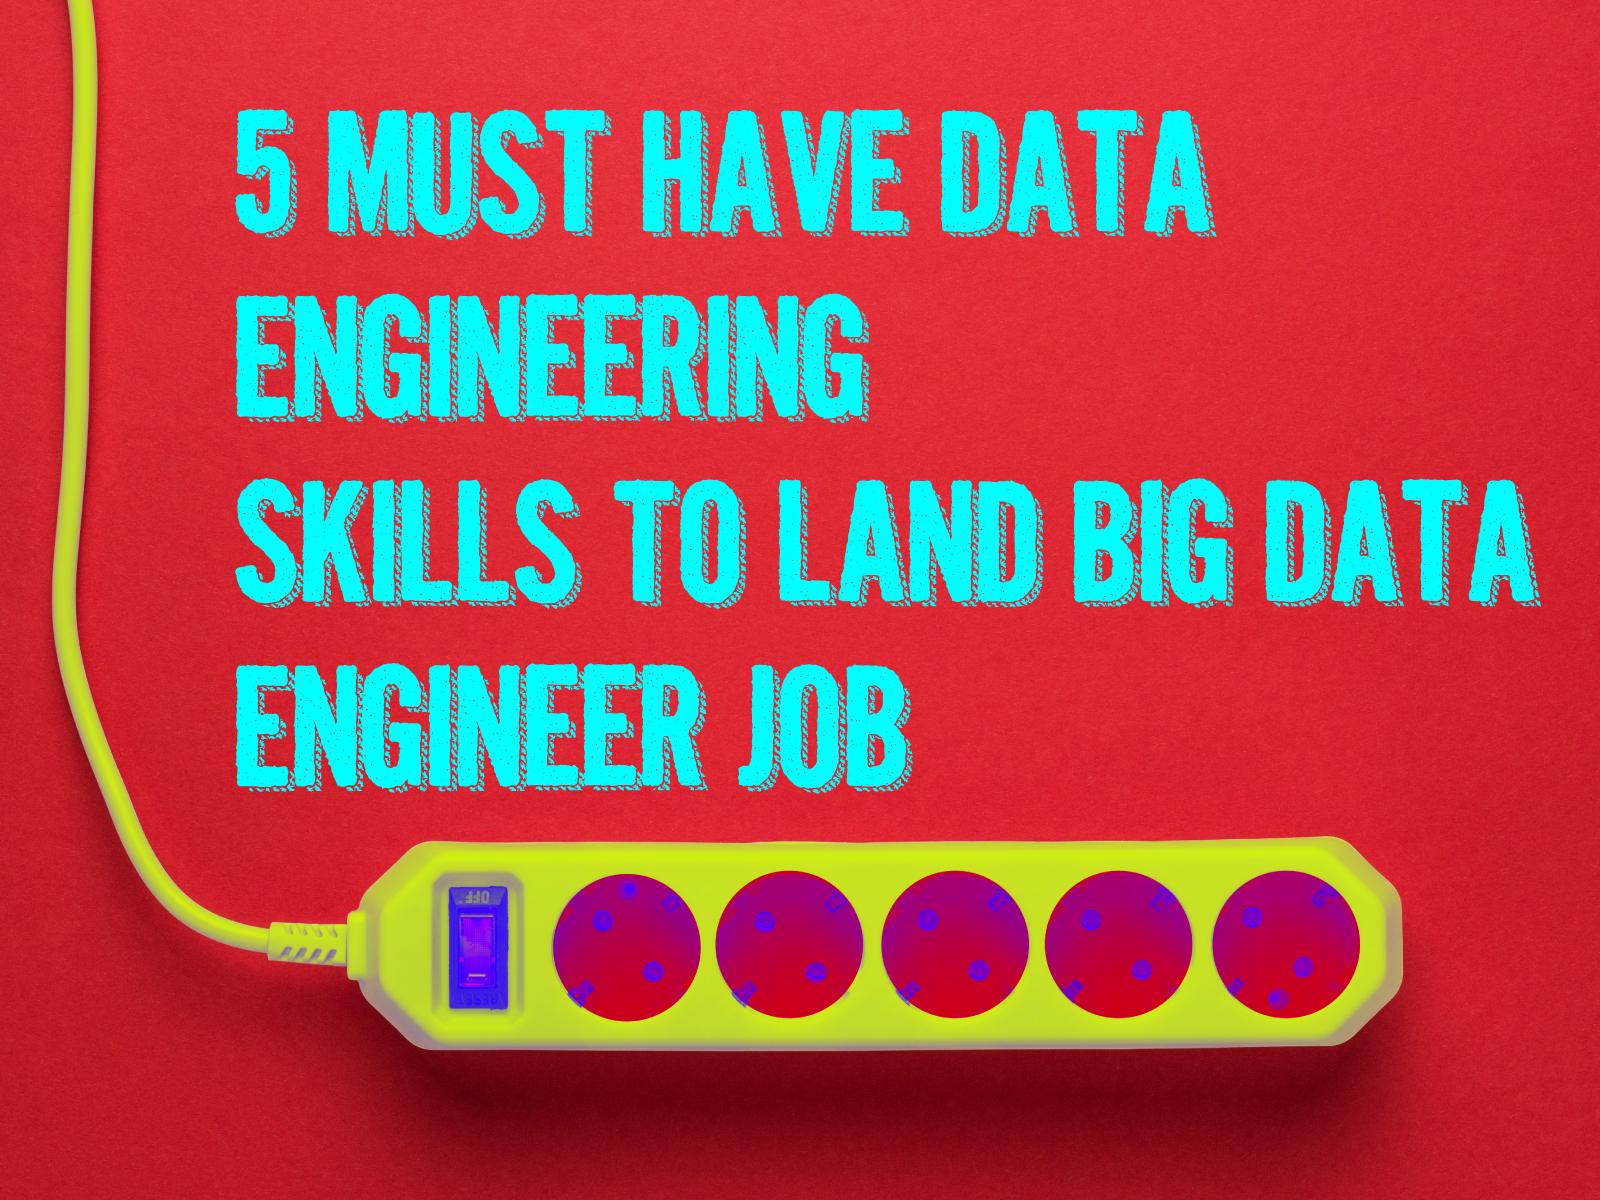 5 Must-Have Data Engineering Skills To Land Big Data Engineer Job In 2019